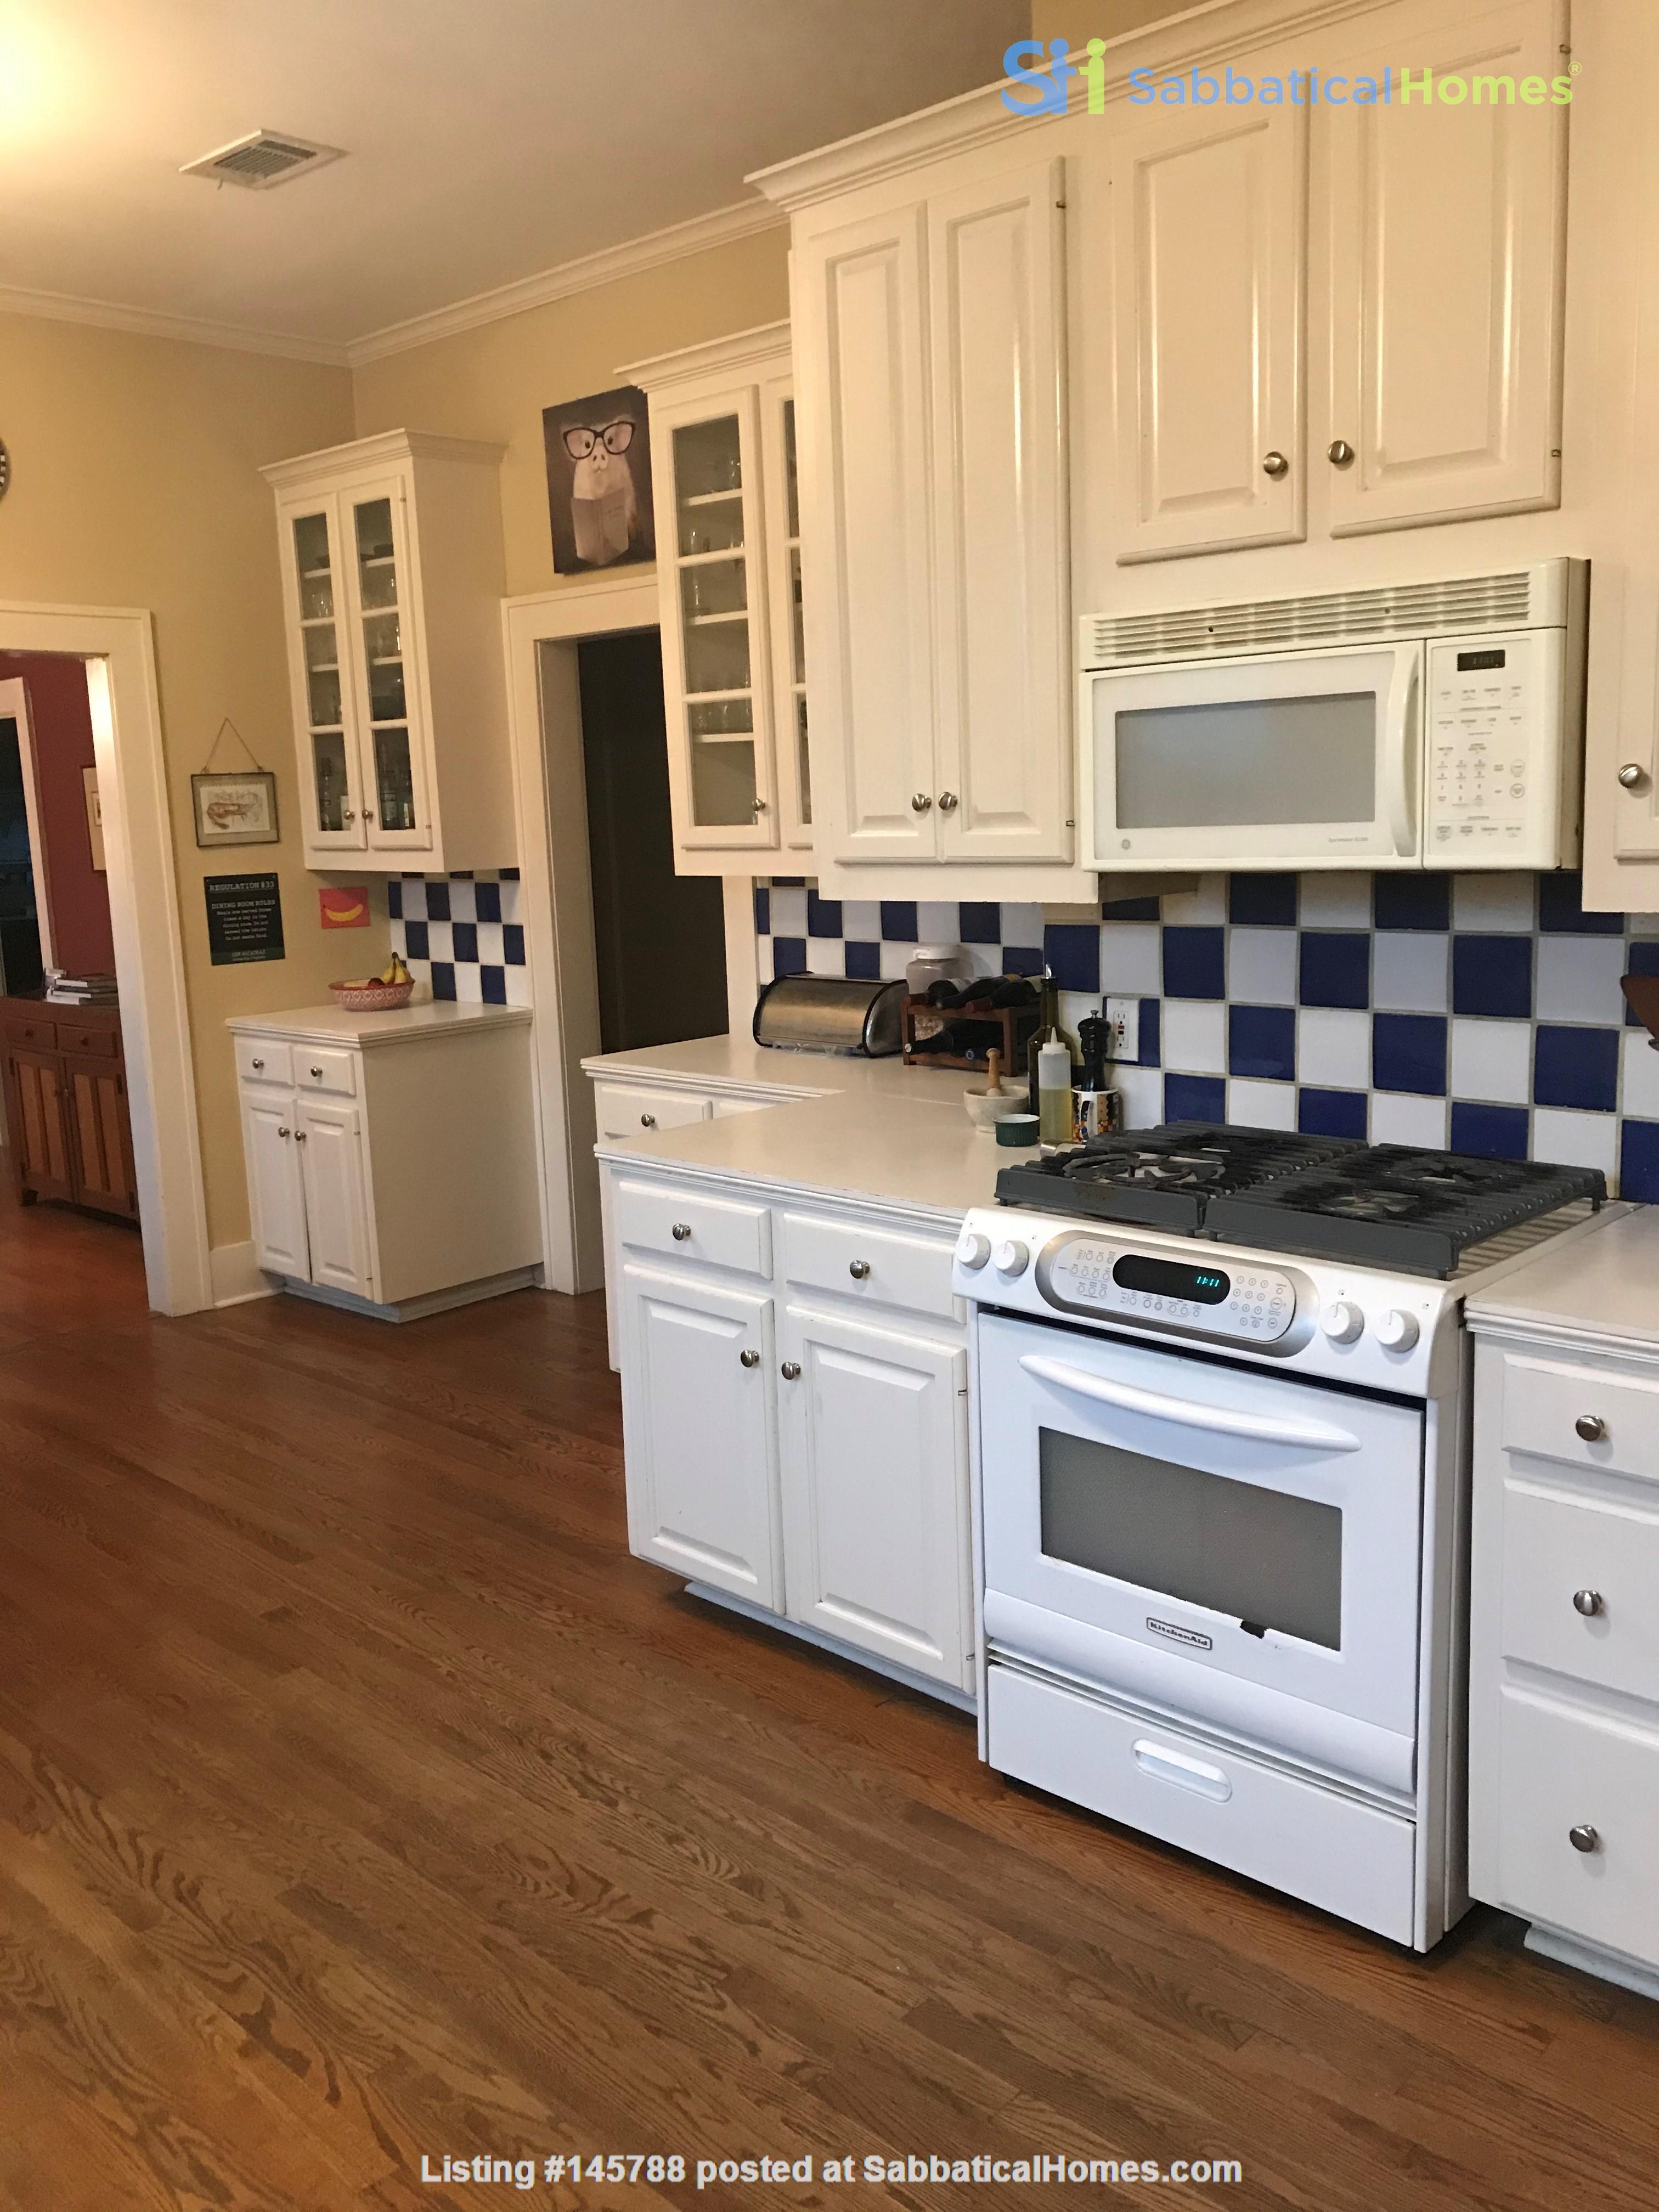 Charming 3 bedroom bungalow in Baton Rouge, Louisiana near LSU Home Rental in Baton Rouge 4